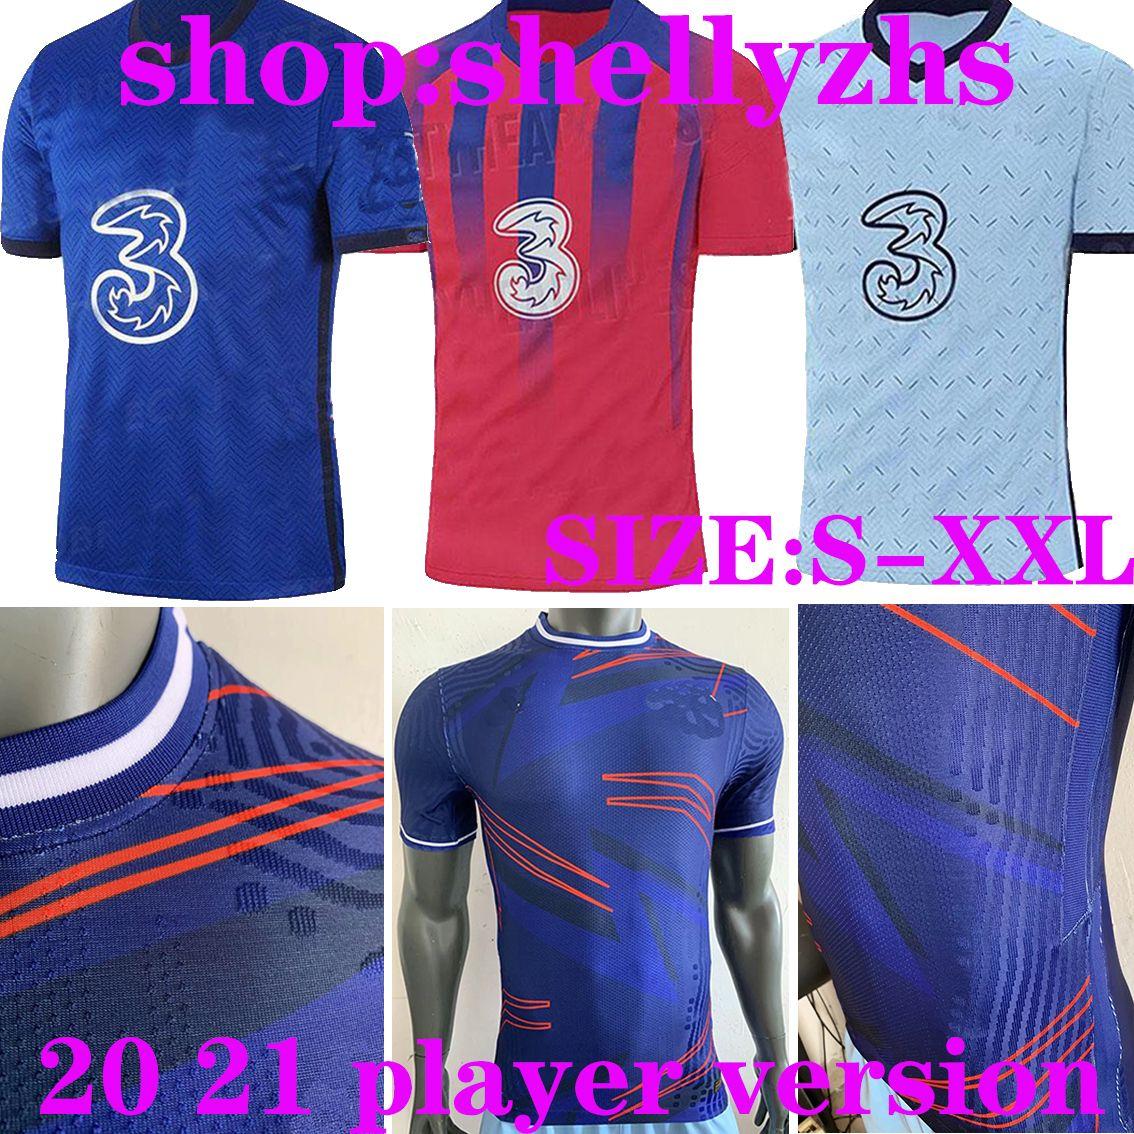 20 21 Игрок Версия Pulisic Soccer Trackys 2020 2021 гора Авраама Уильян Педро Лампарда Футбольная футболка HUDSON ODOI Kante Men Kit